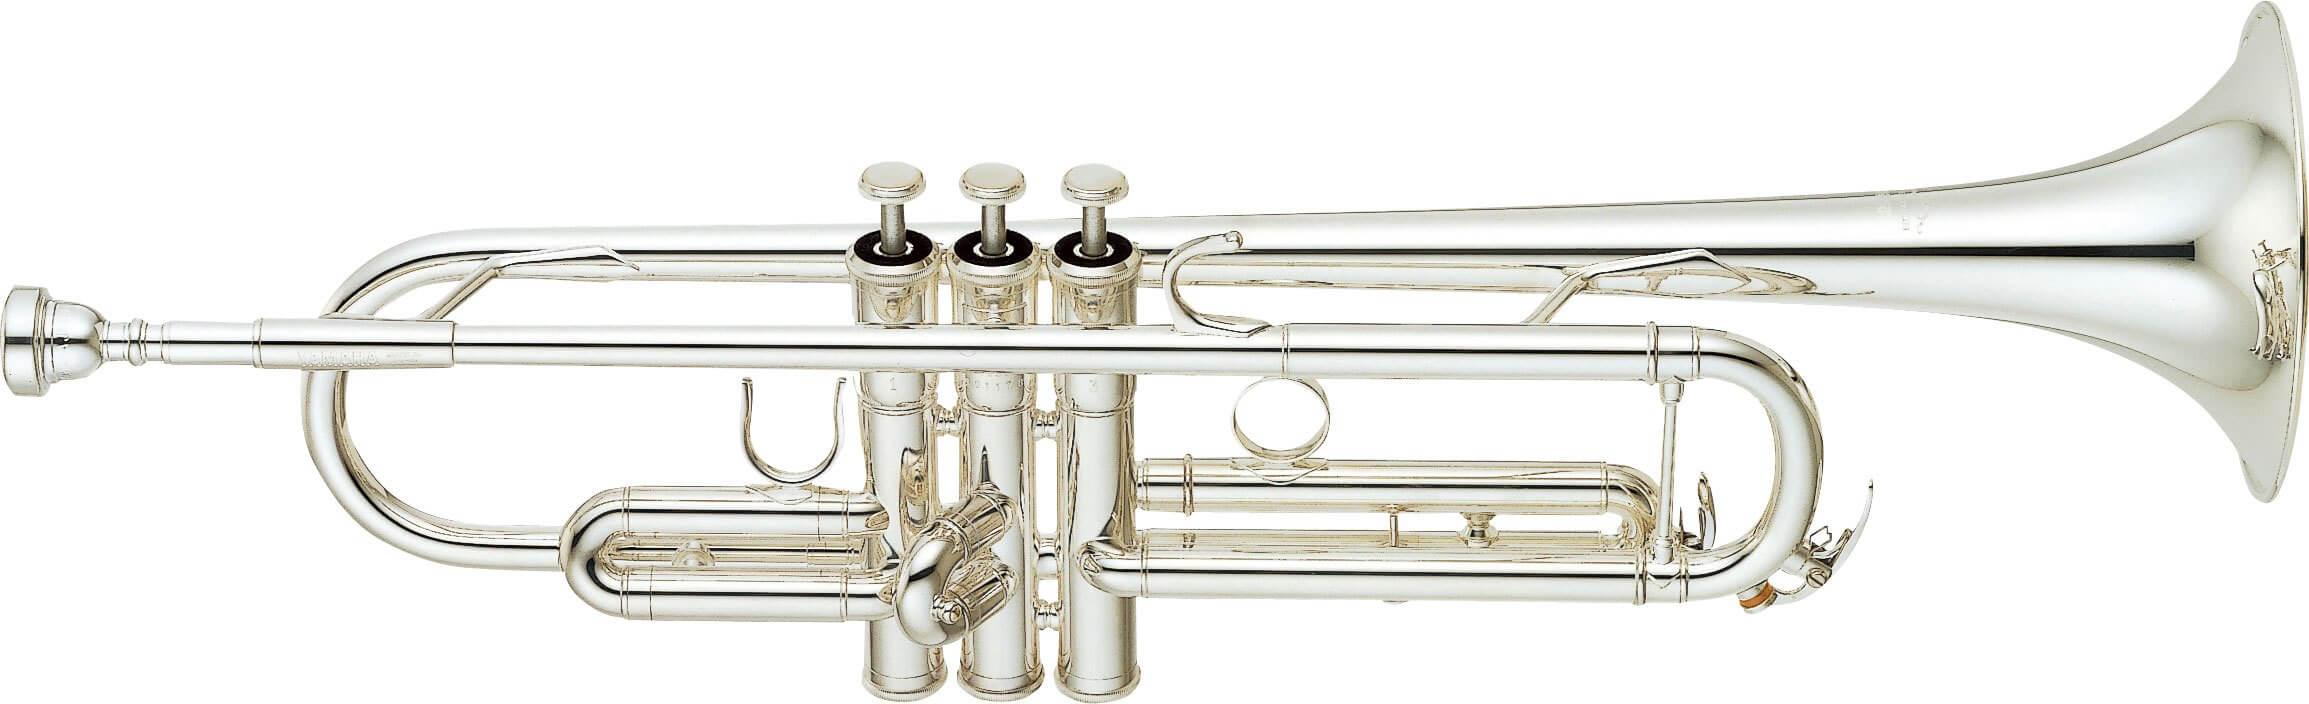 Trompeta Yamaha Ytr 6345Gs Plateada